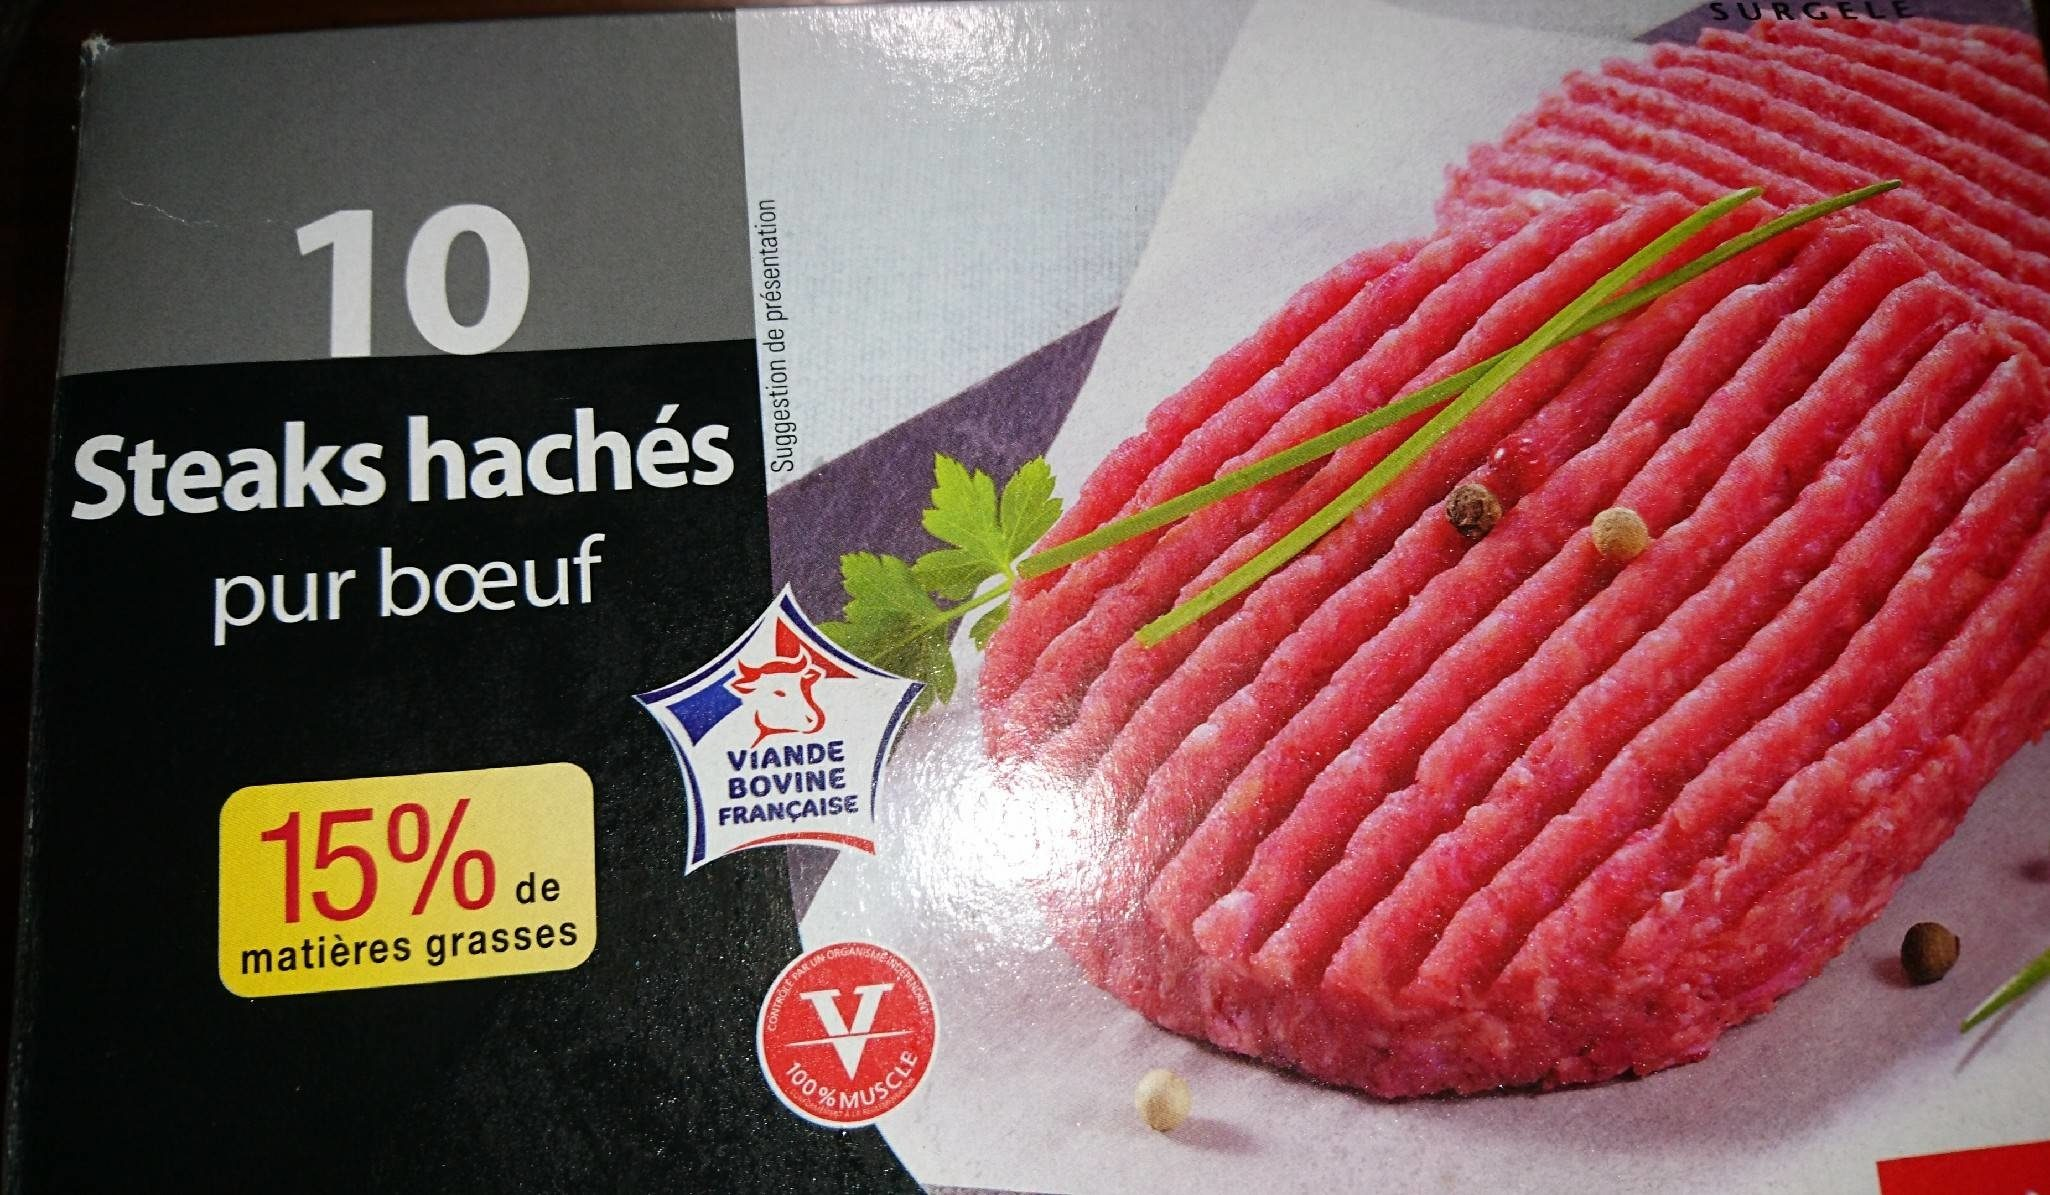 Steaks hachés pur boeuf - Product